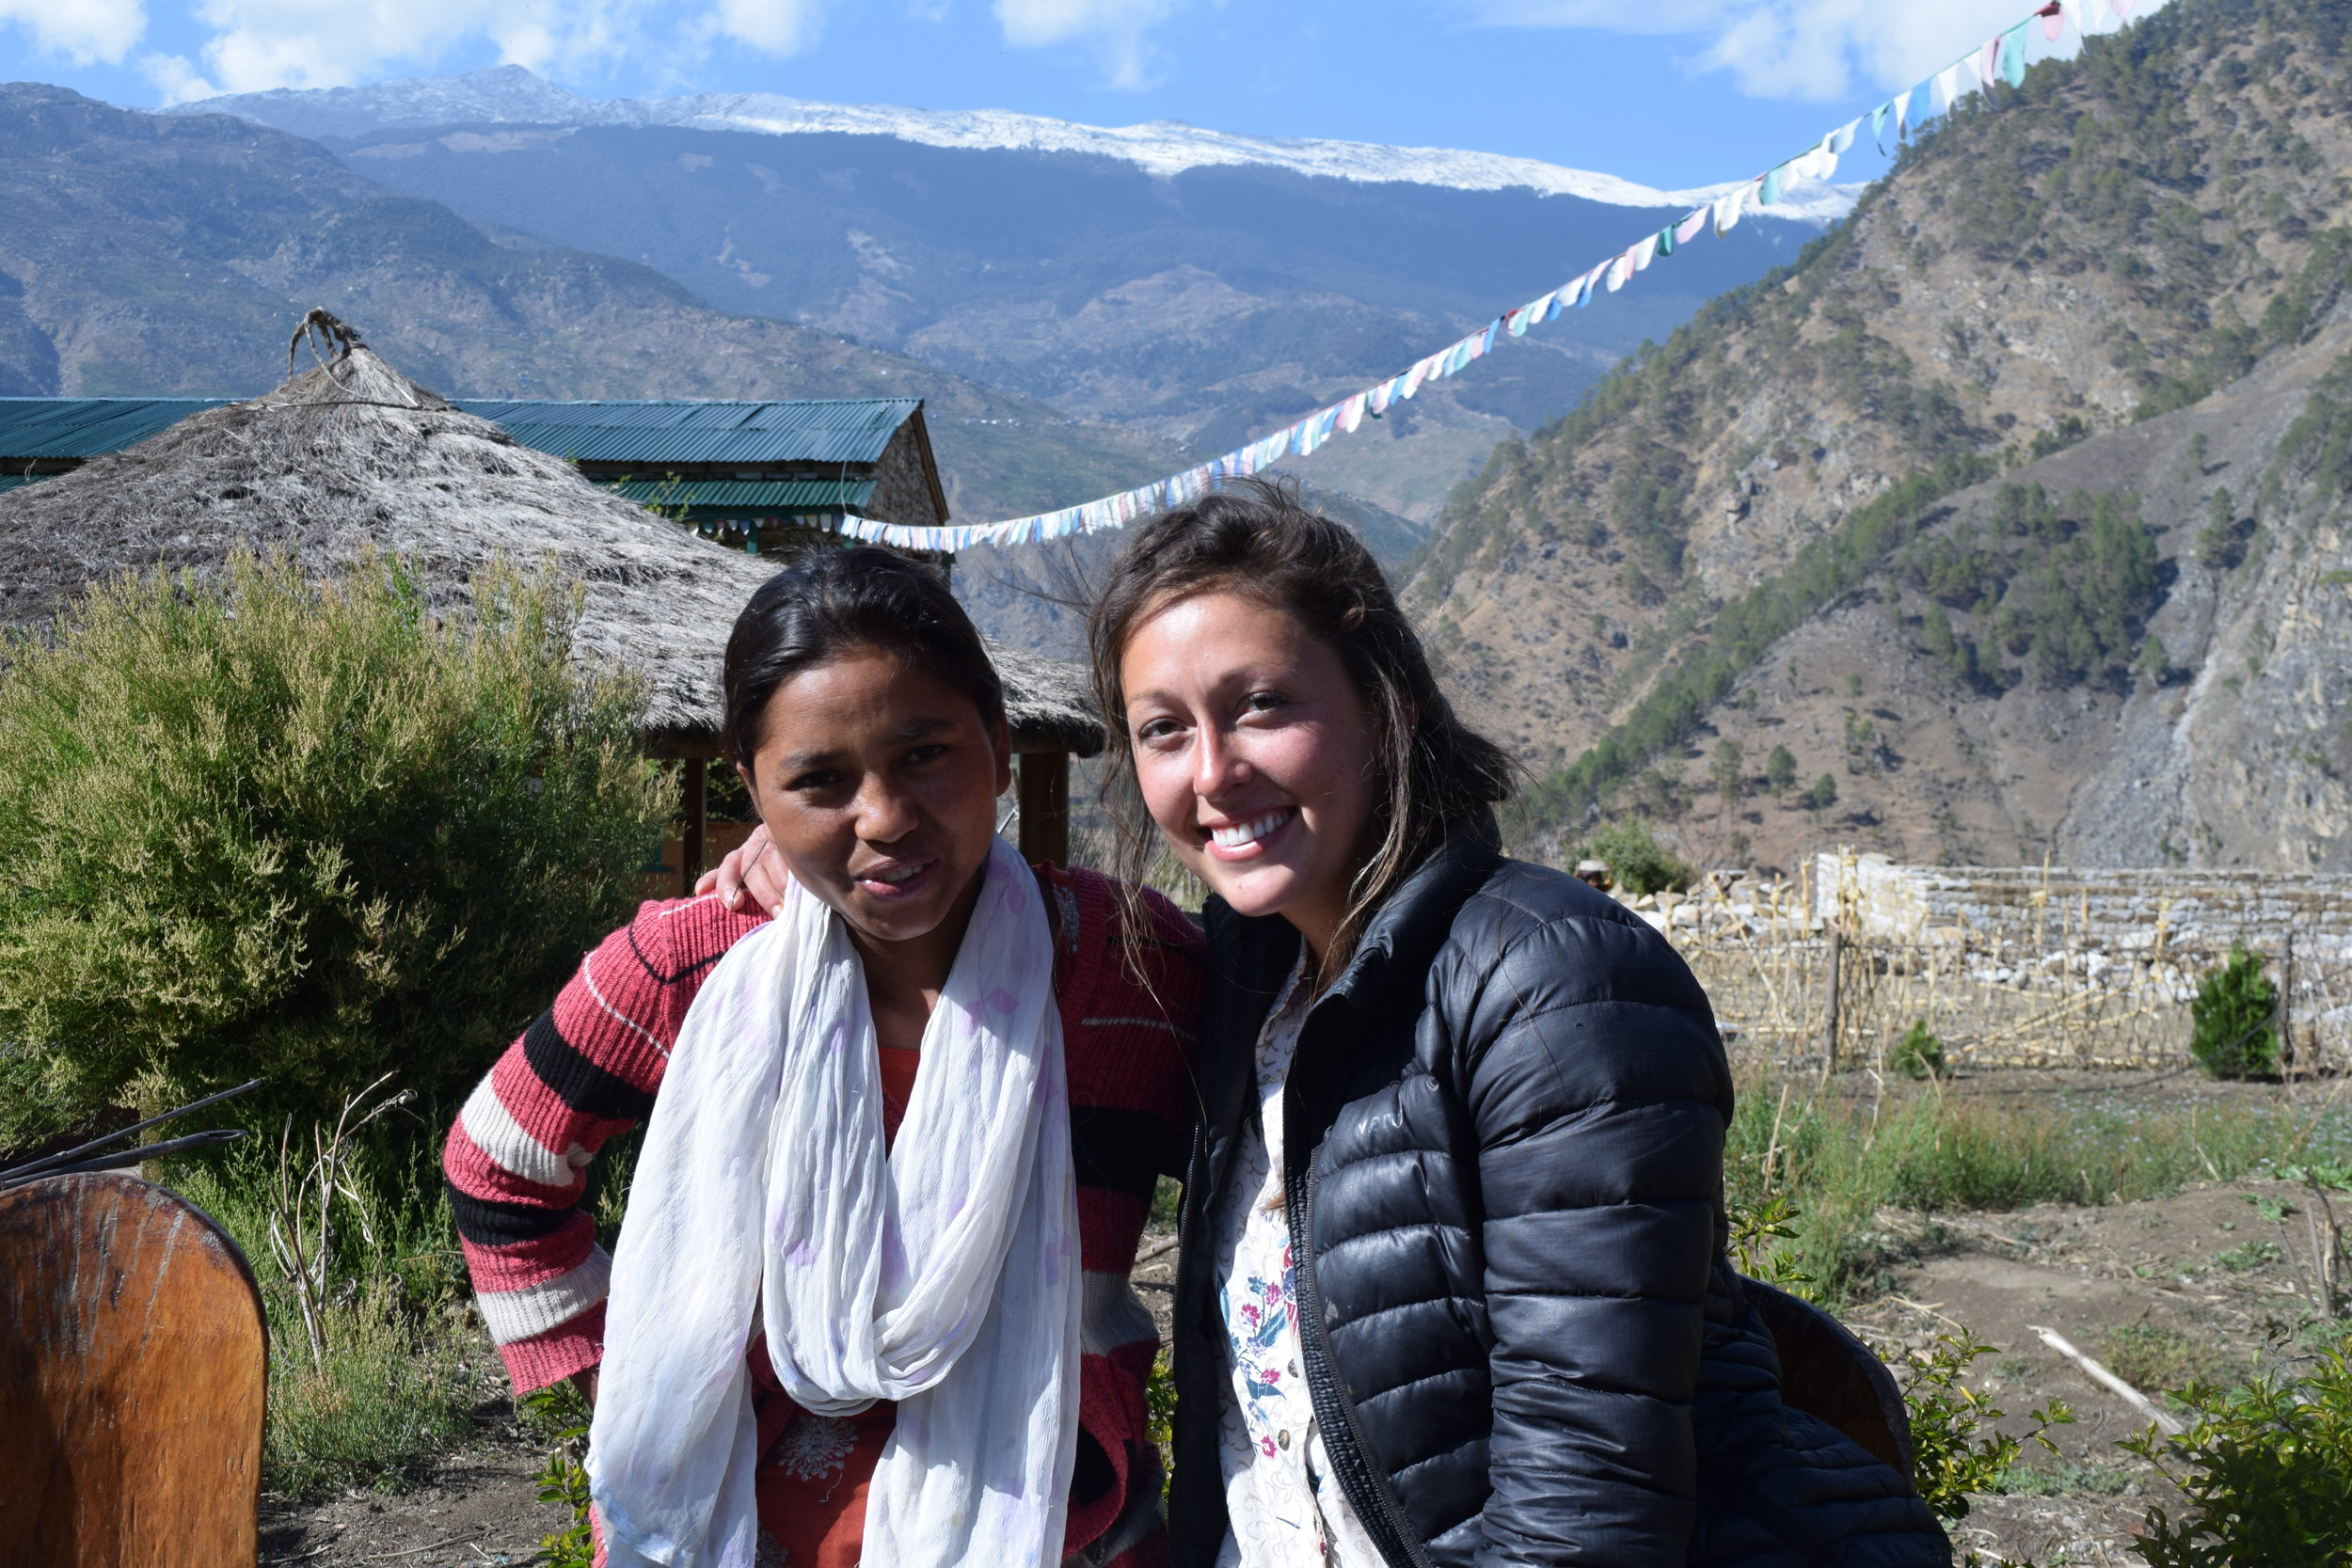 Taylor and Rajenpura after one of Rajenpura's menstrual health teaching sessions.